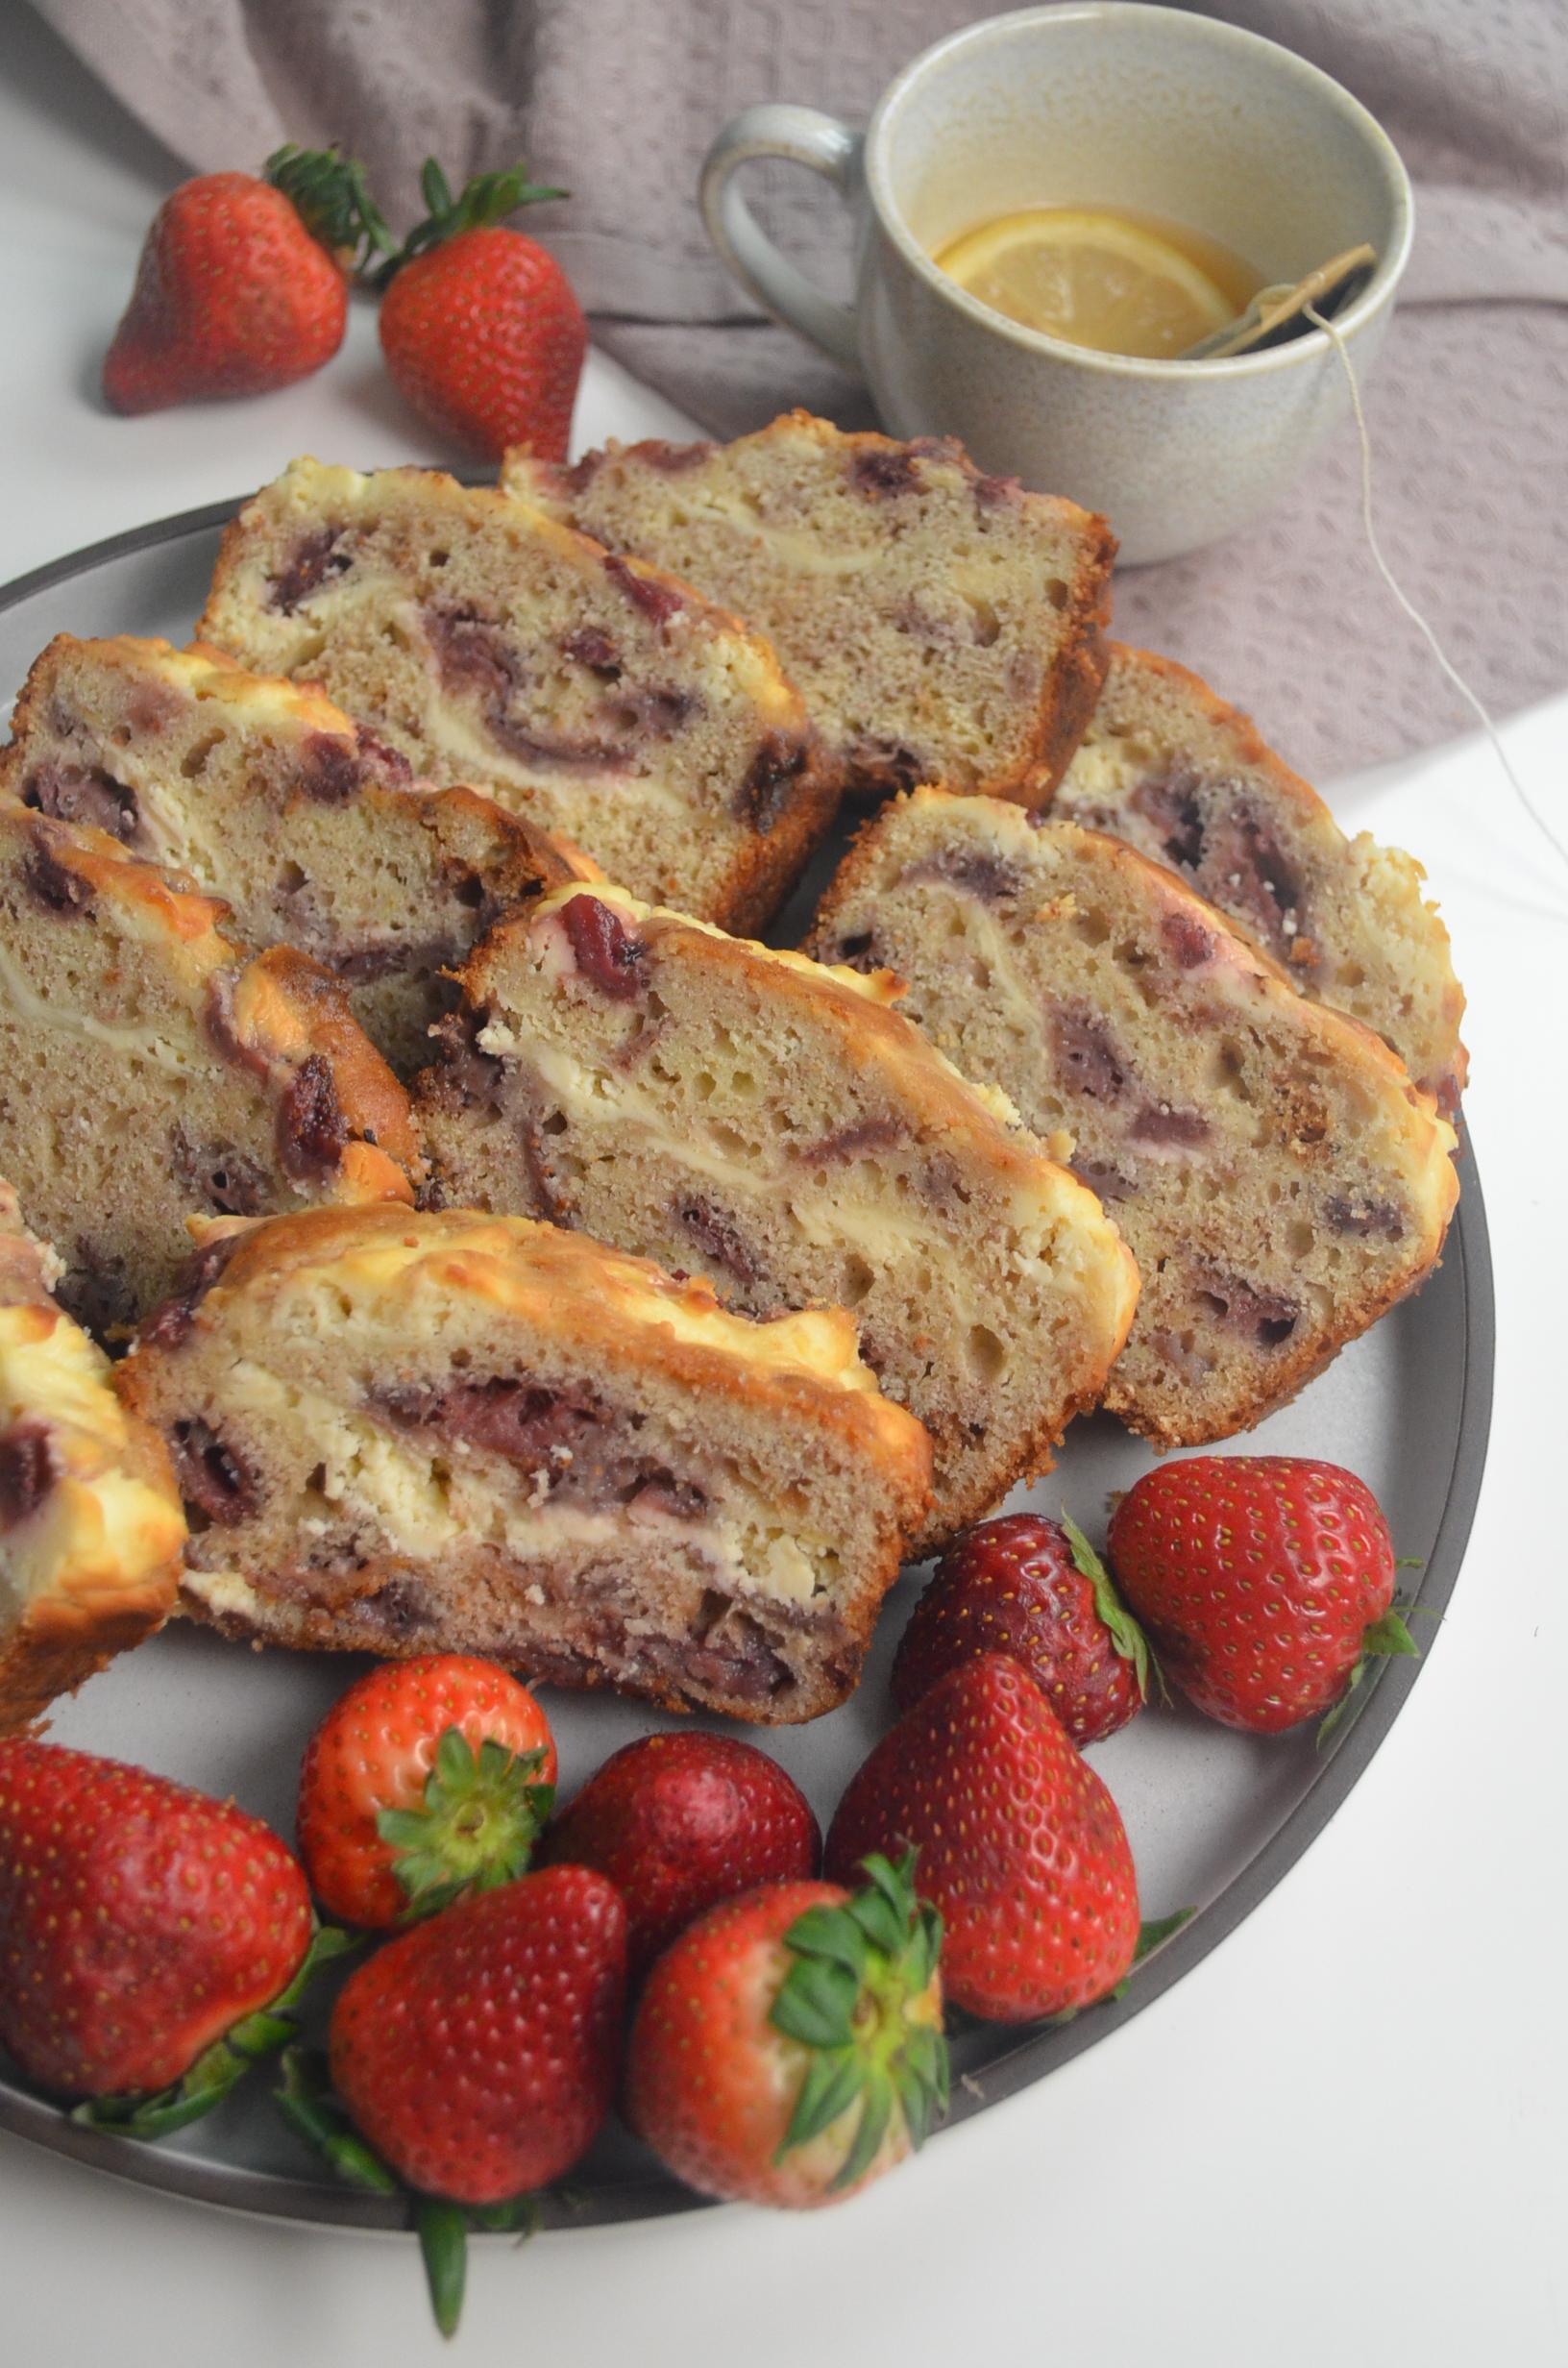 Strawberry Cream Cheese Banana Bread